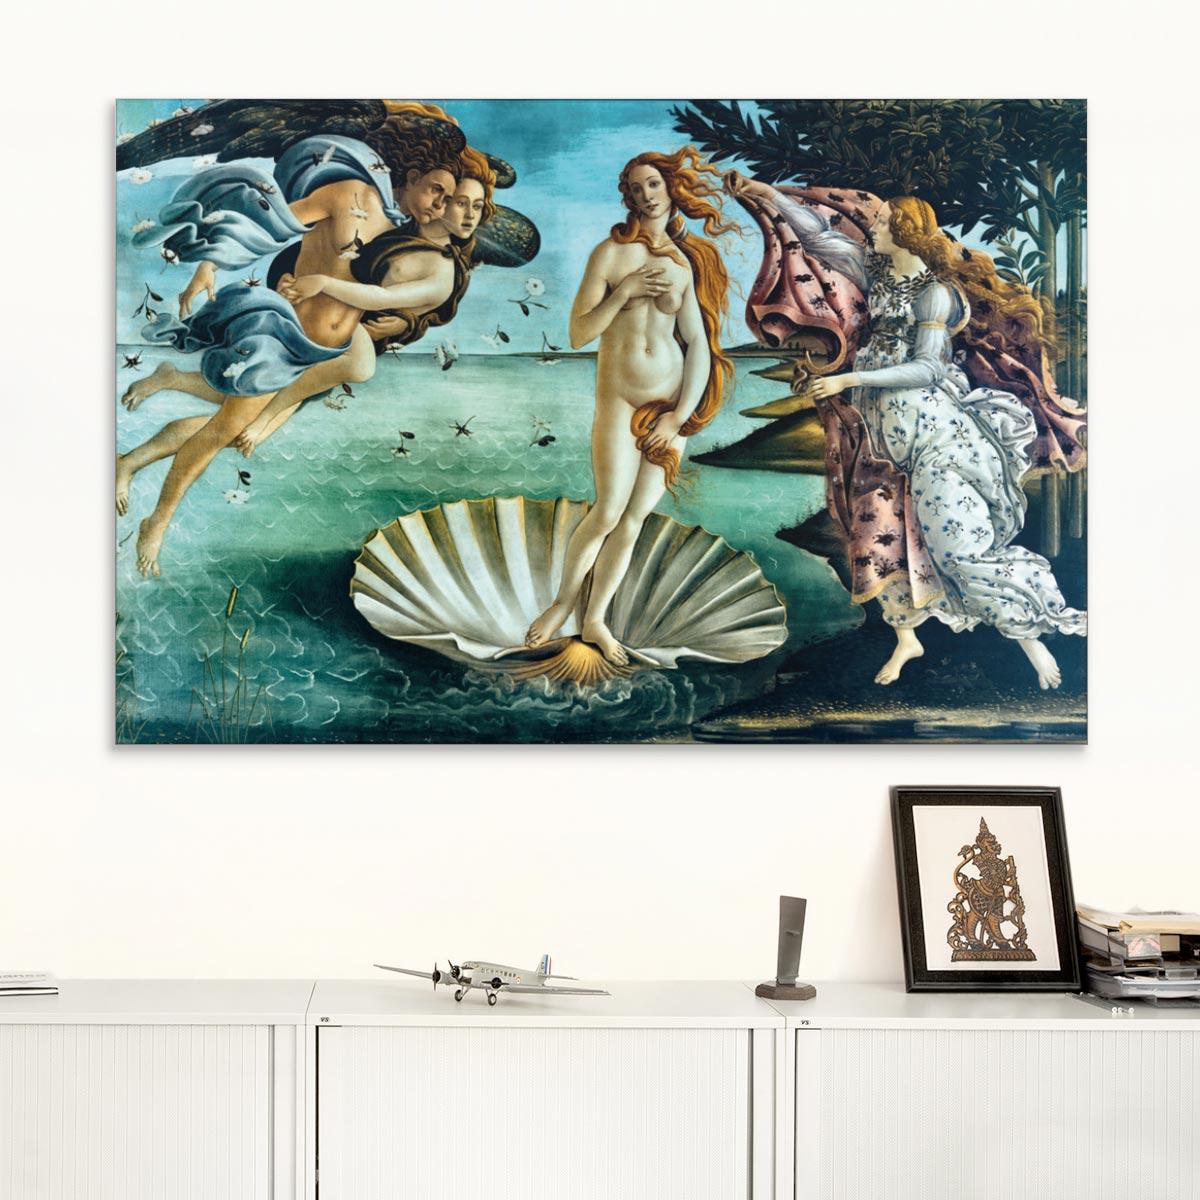 "Akustikbild ""Die Geburt der Venus"", Sandro Botticelli"